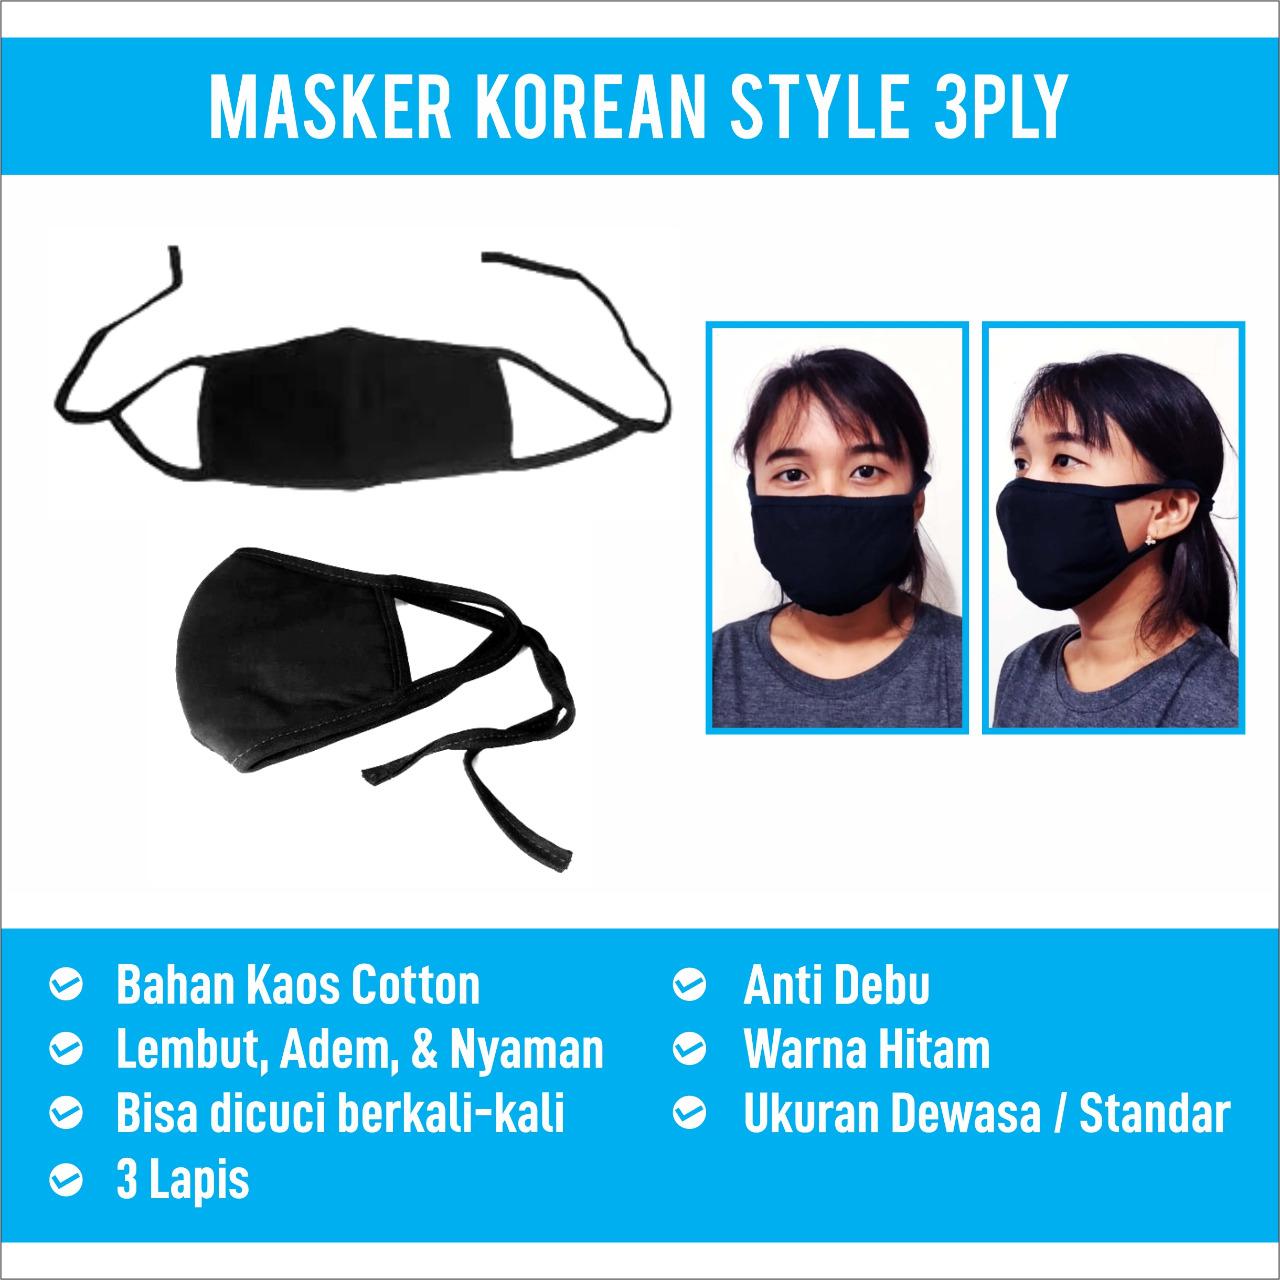 Masker Korean Style 3 ply (isi 50) Warna Hitam